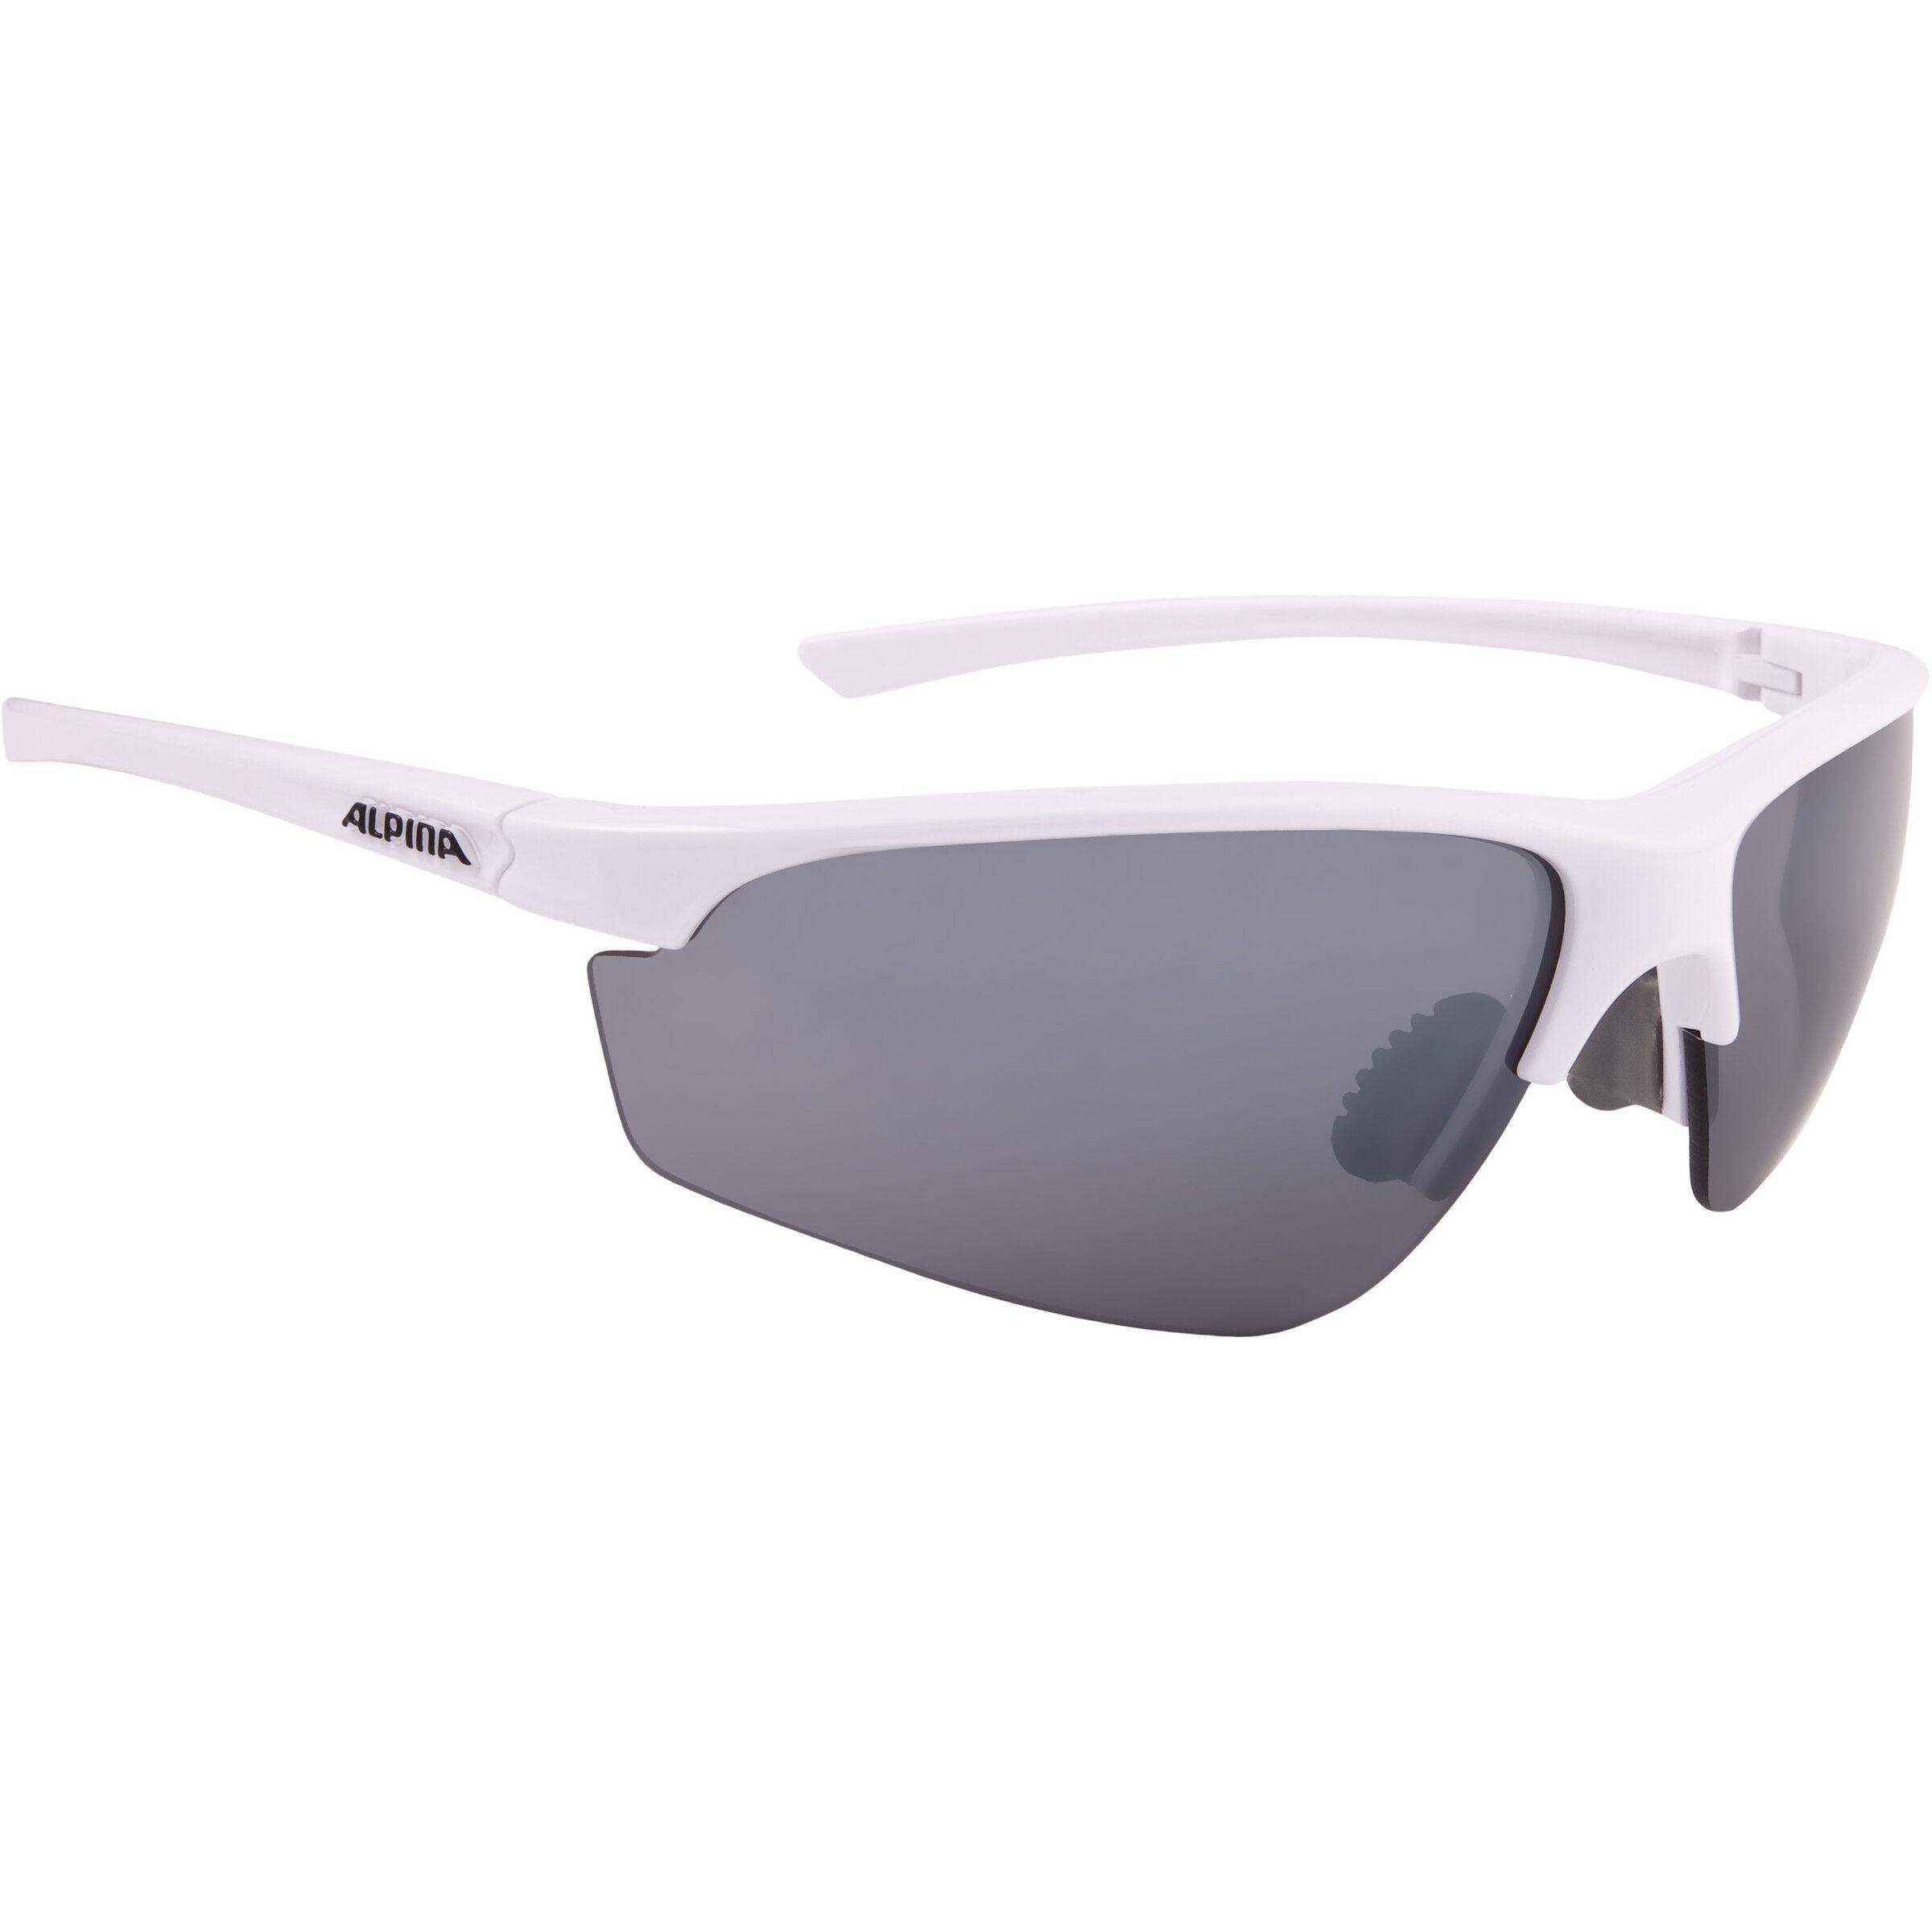 2er Pack X-CRUZE® XC011 Locs Fahrradbrille Sonnenbrille Brille Männer Frauen rot